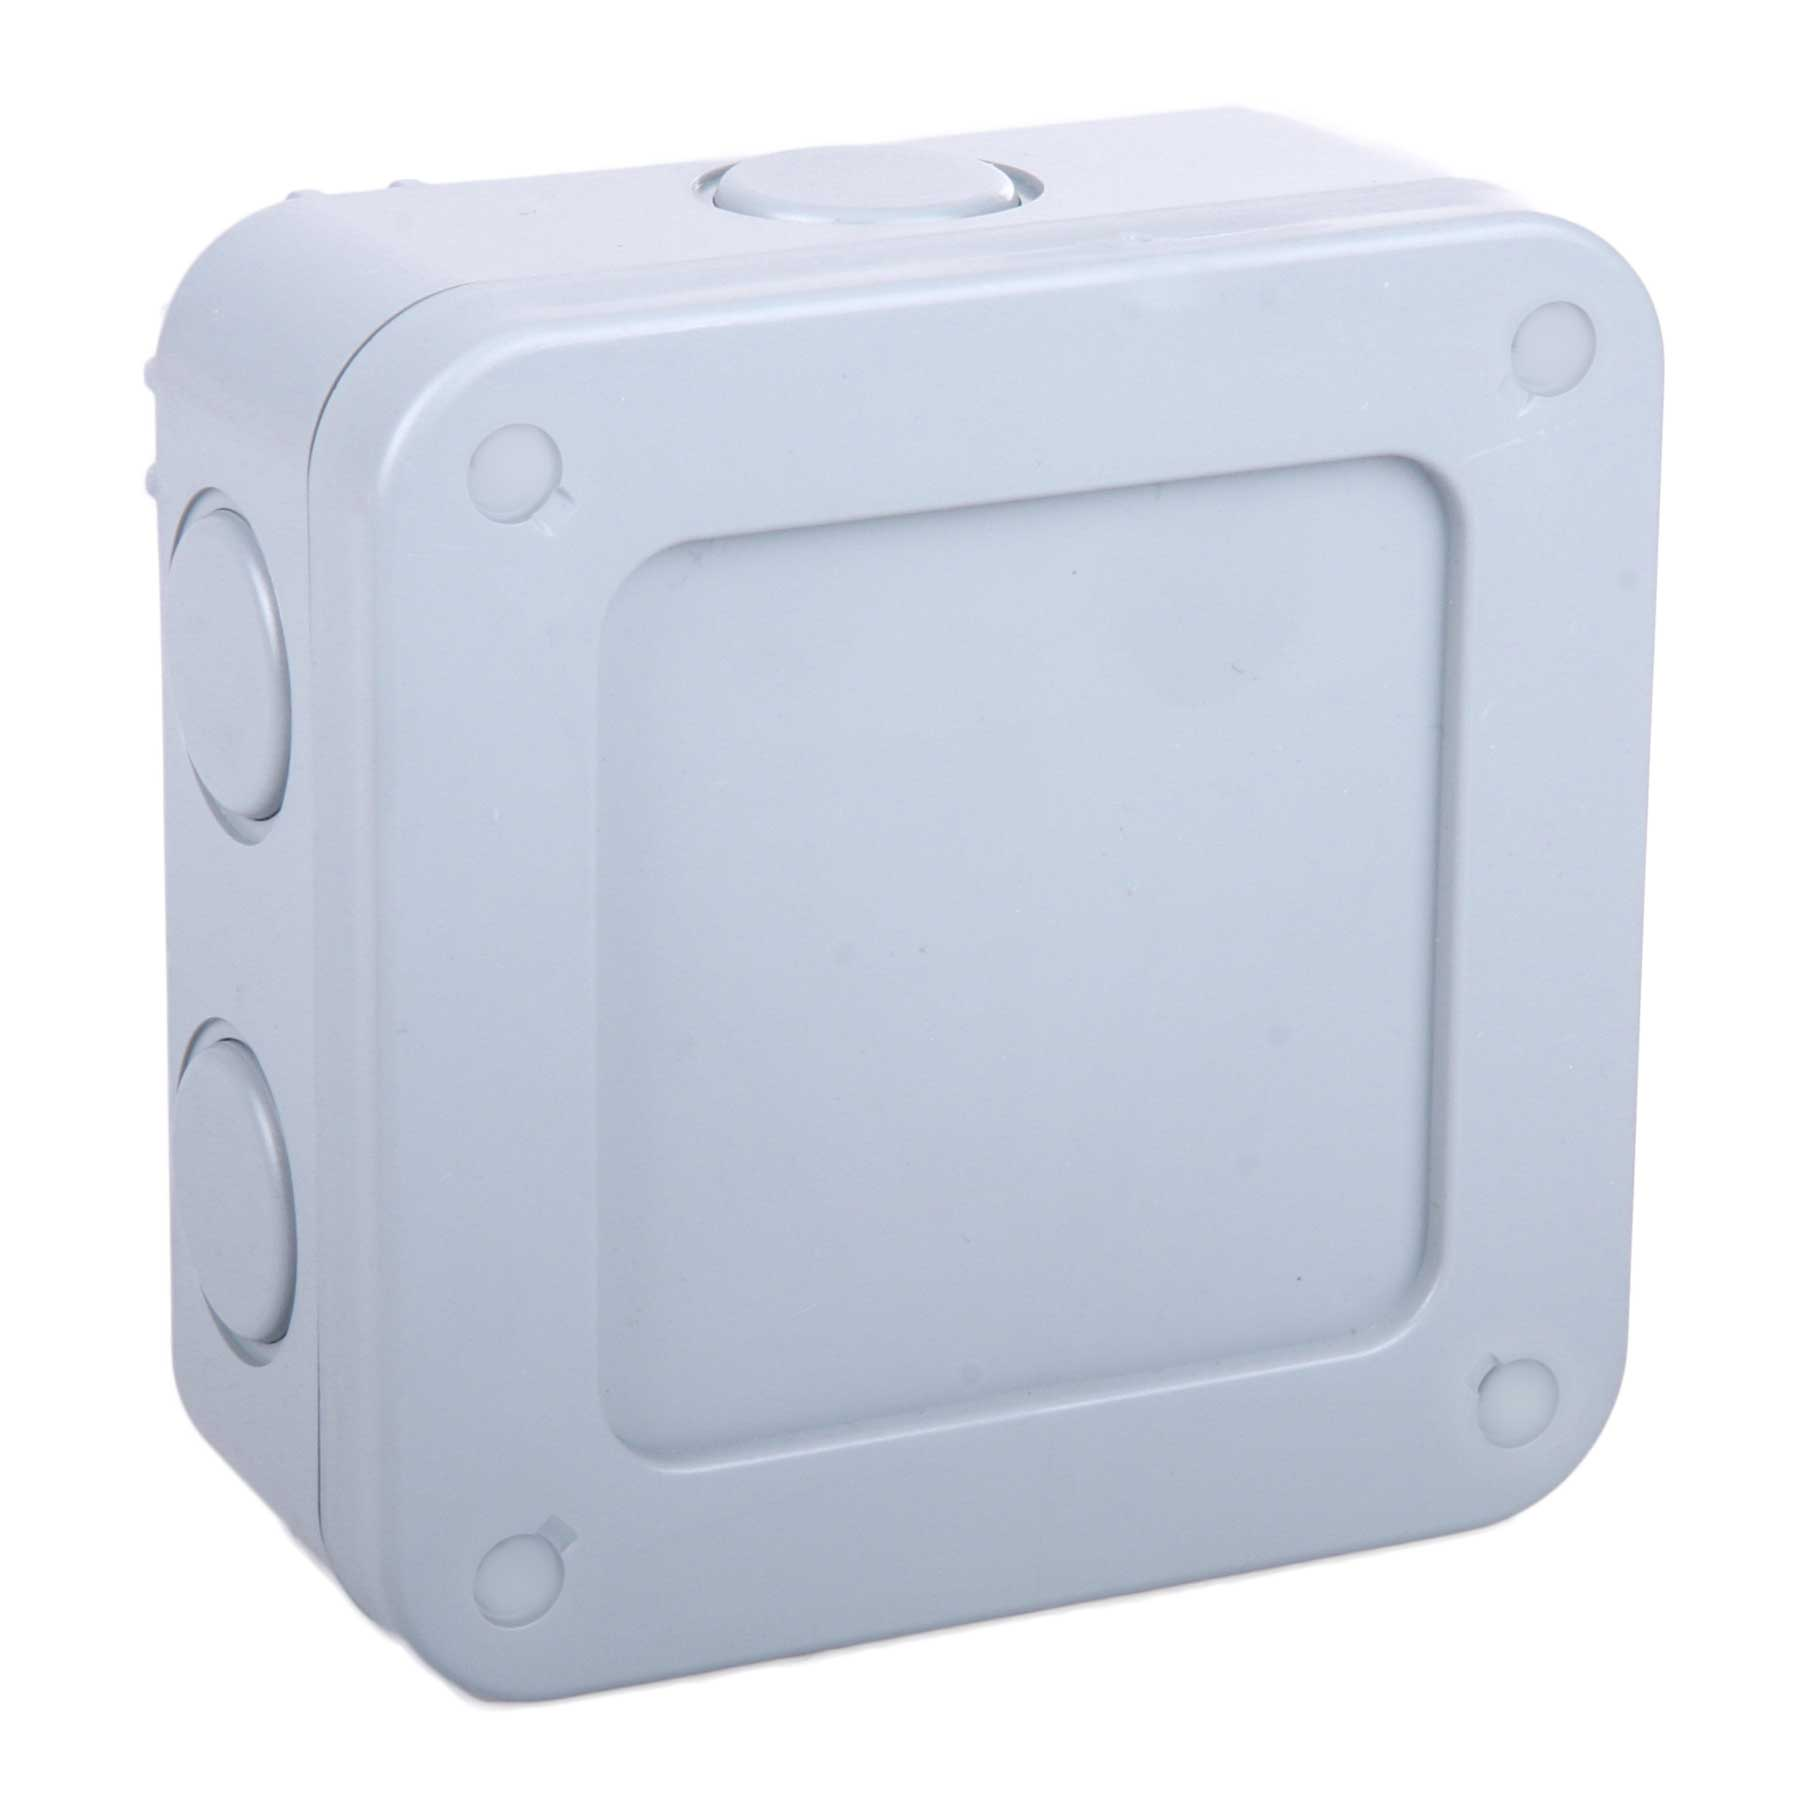 Masterplug Weatherproof Outdoor Junction Box 5 Pole Terminal Block Masterplug Weatherproof